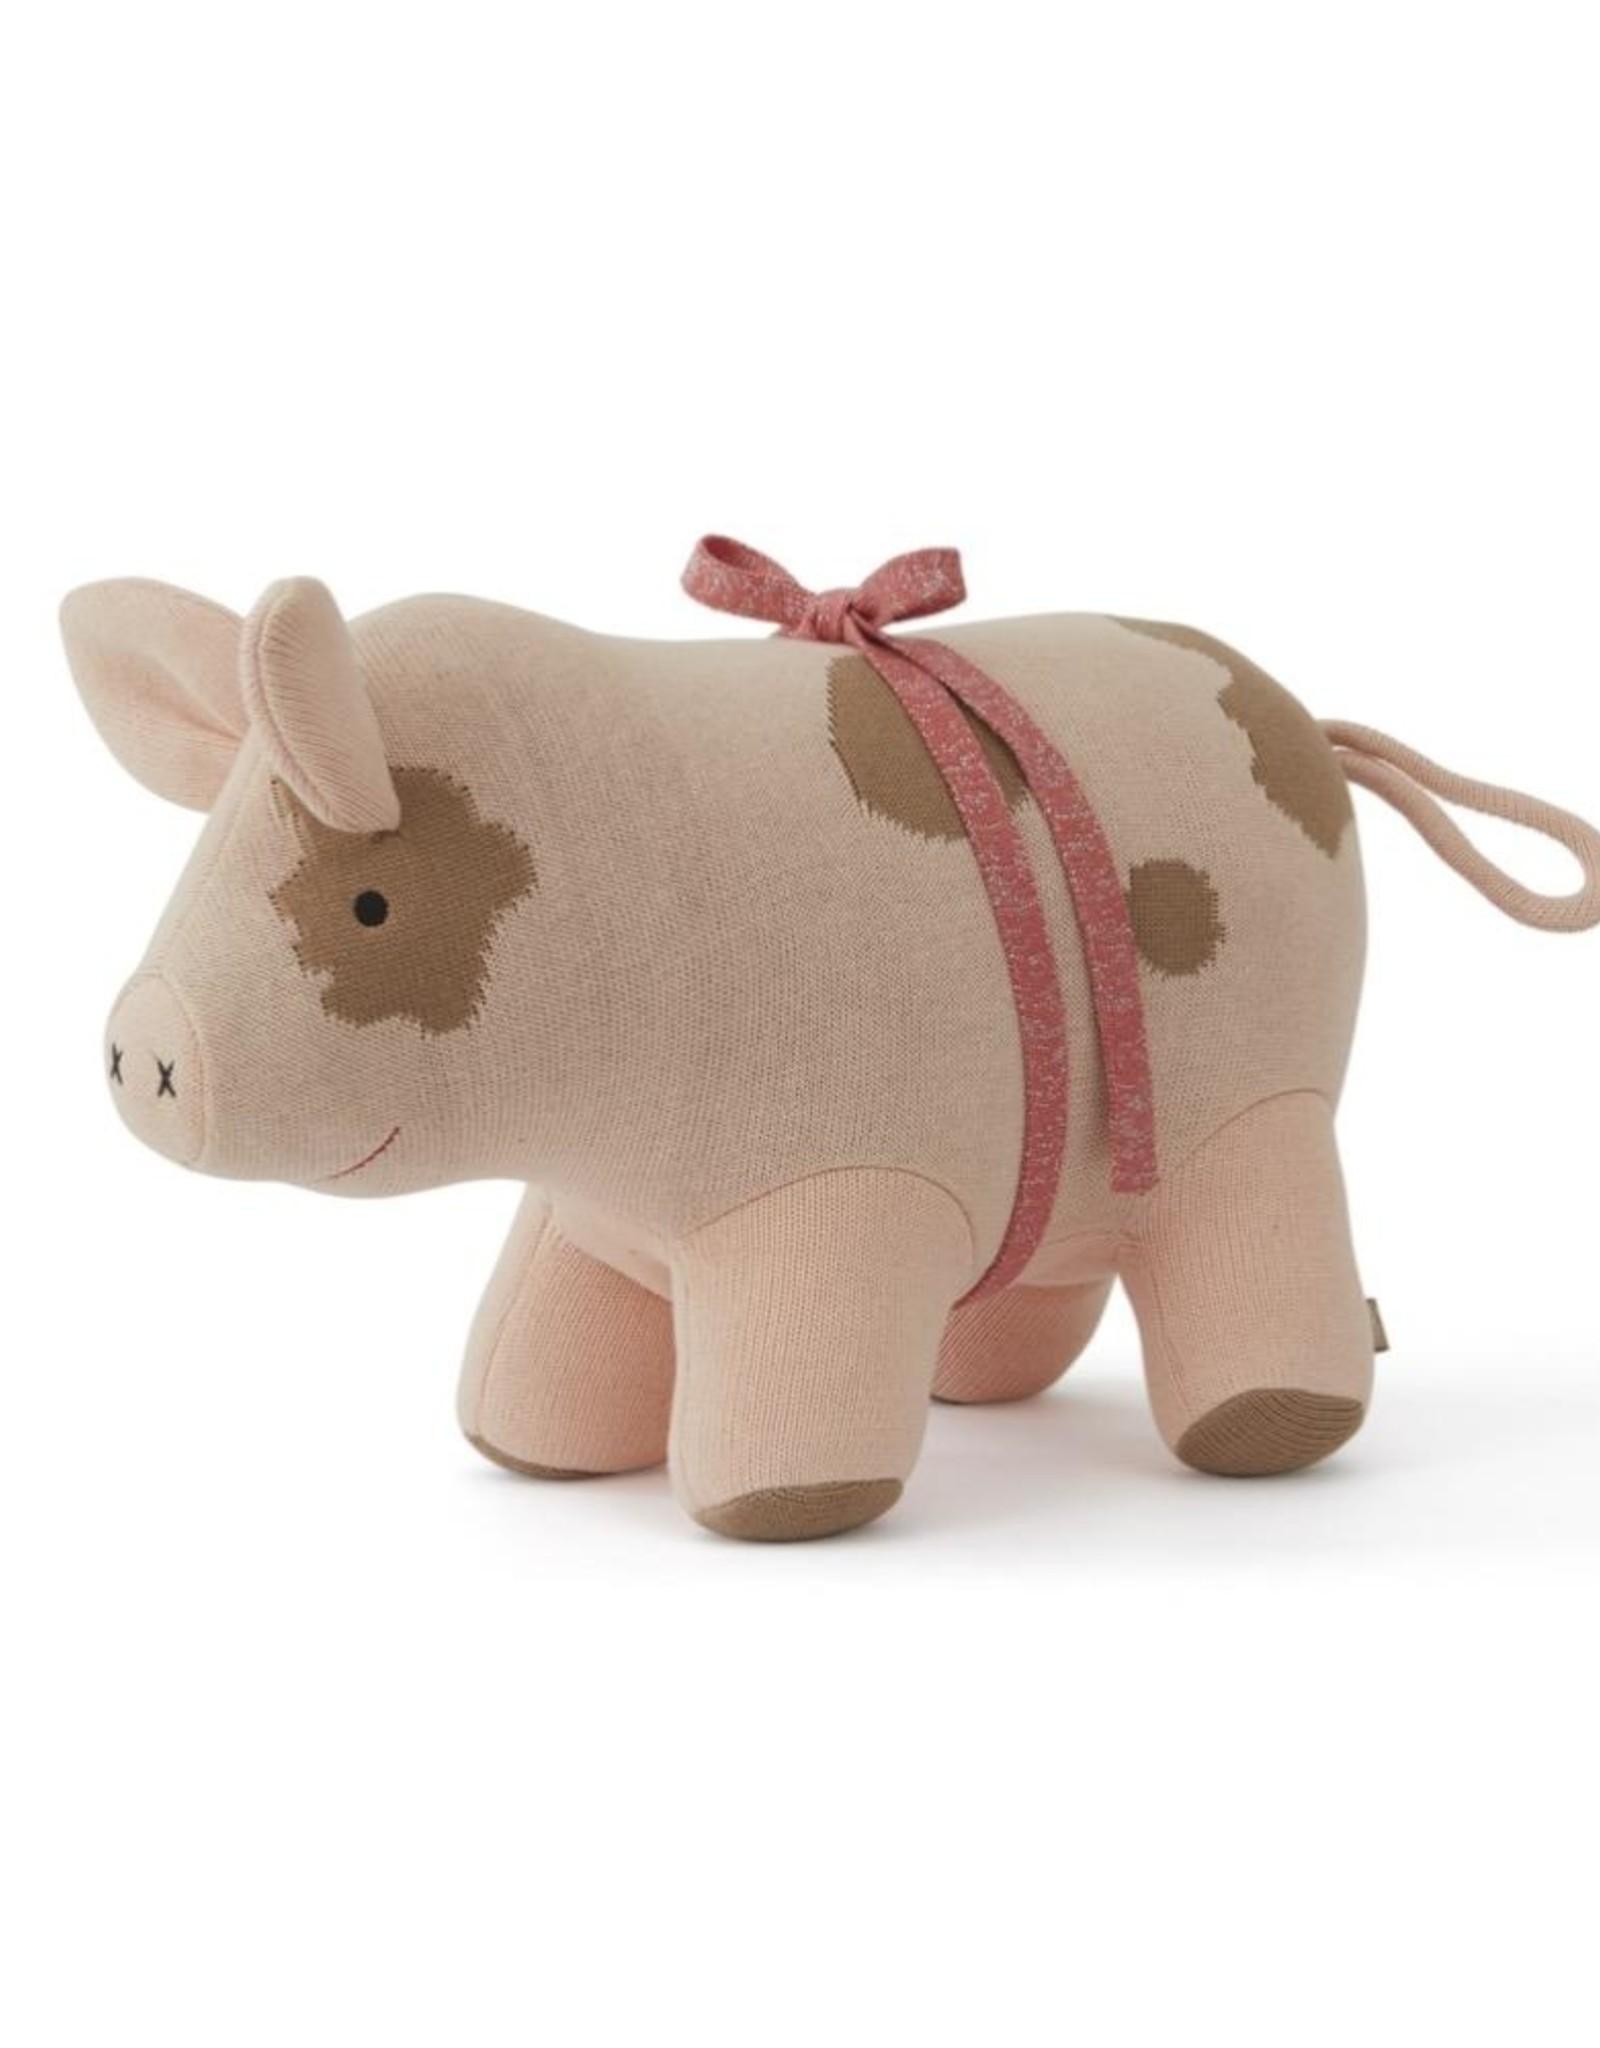 Oyoy Sofie The Pig